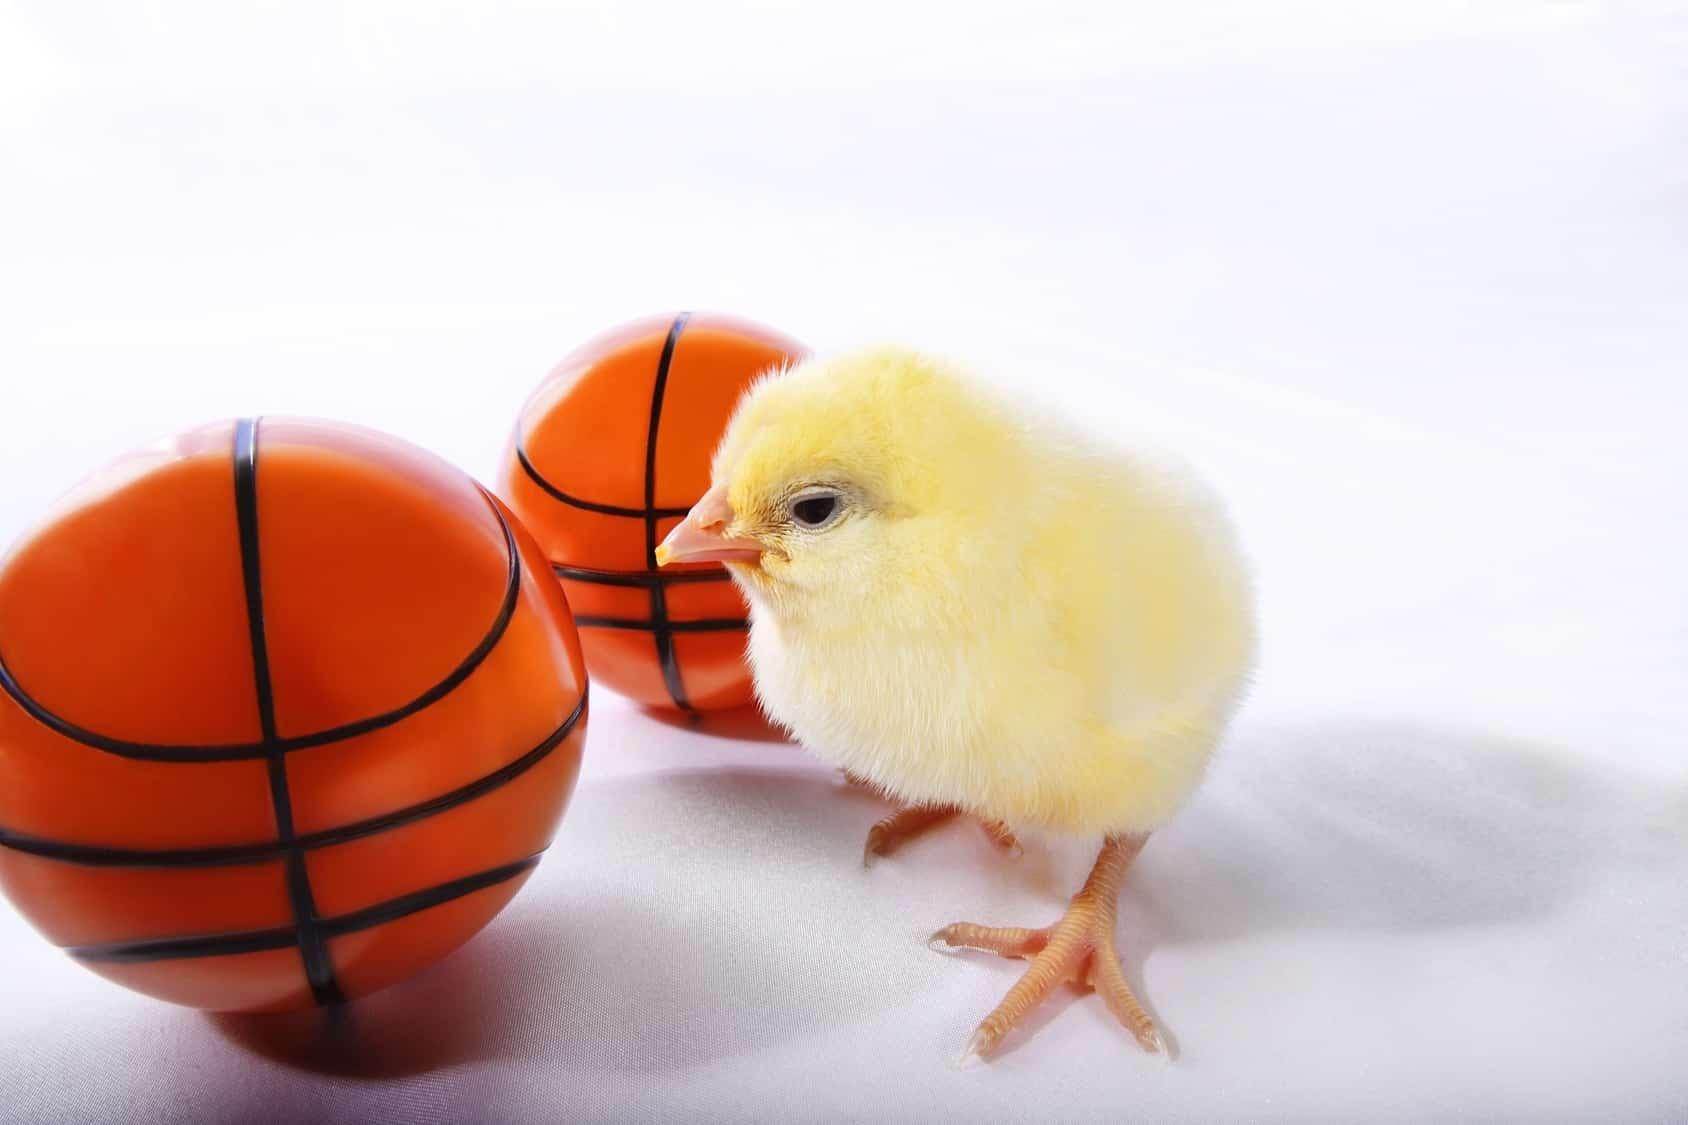 Full court chickens